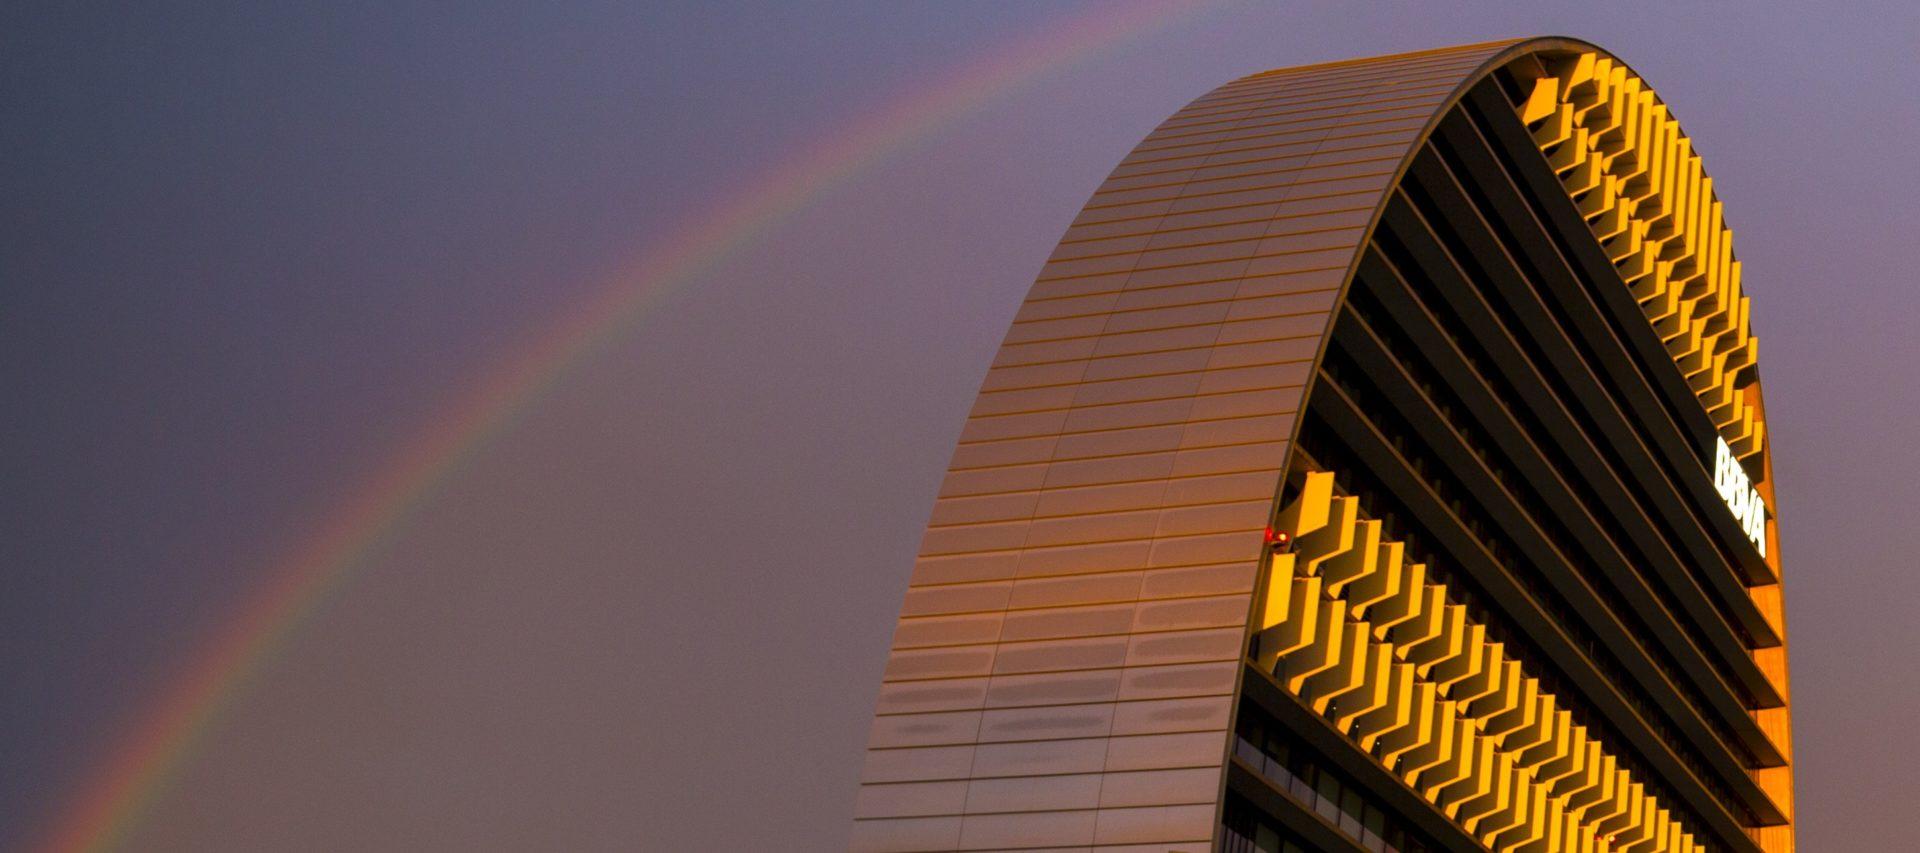 vela_rainbow_web_adaptacion_dos